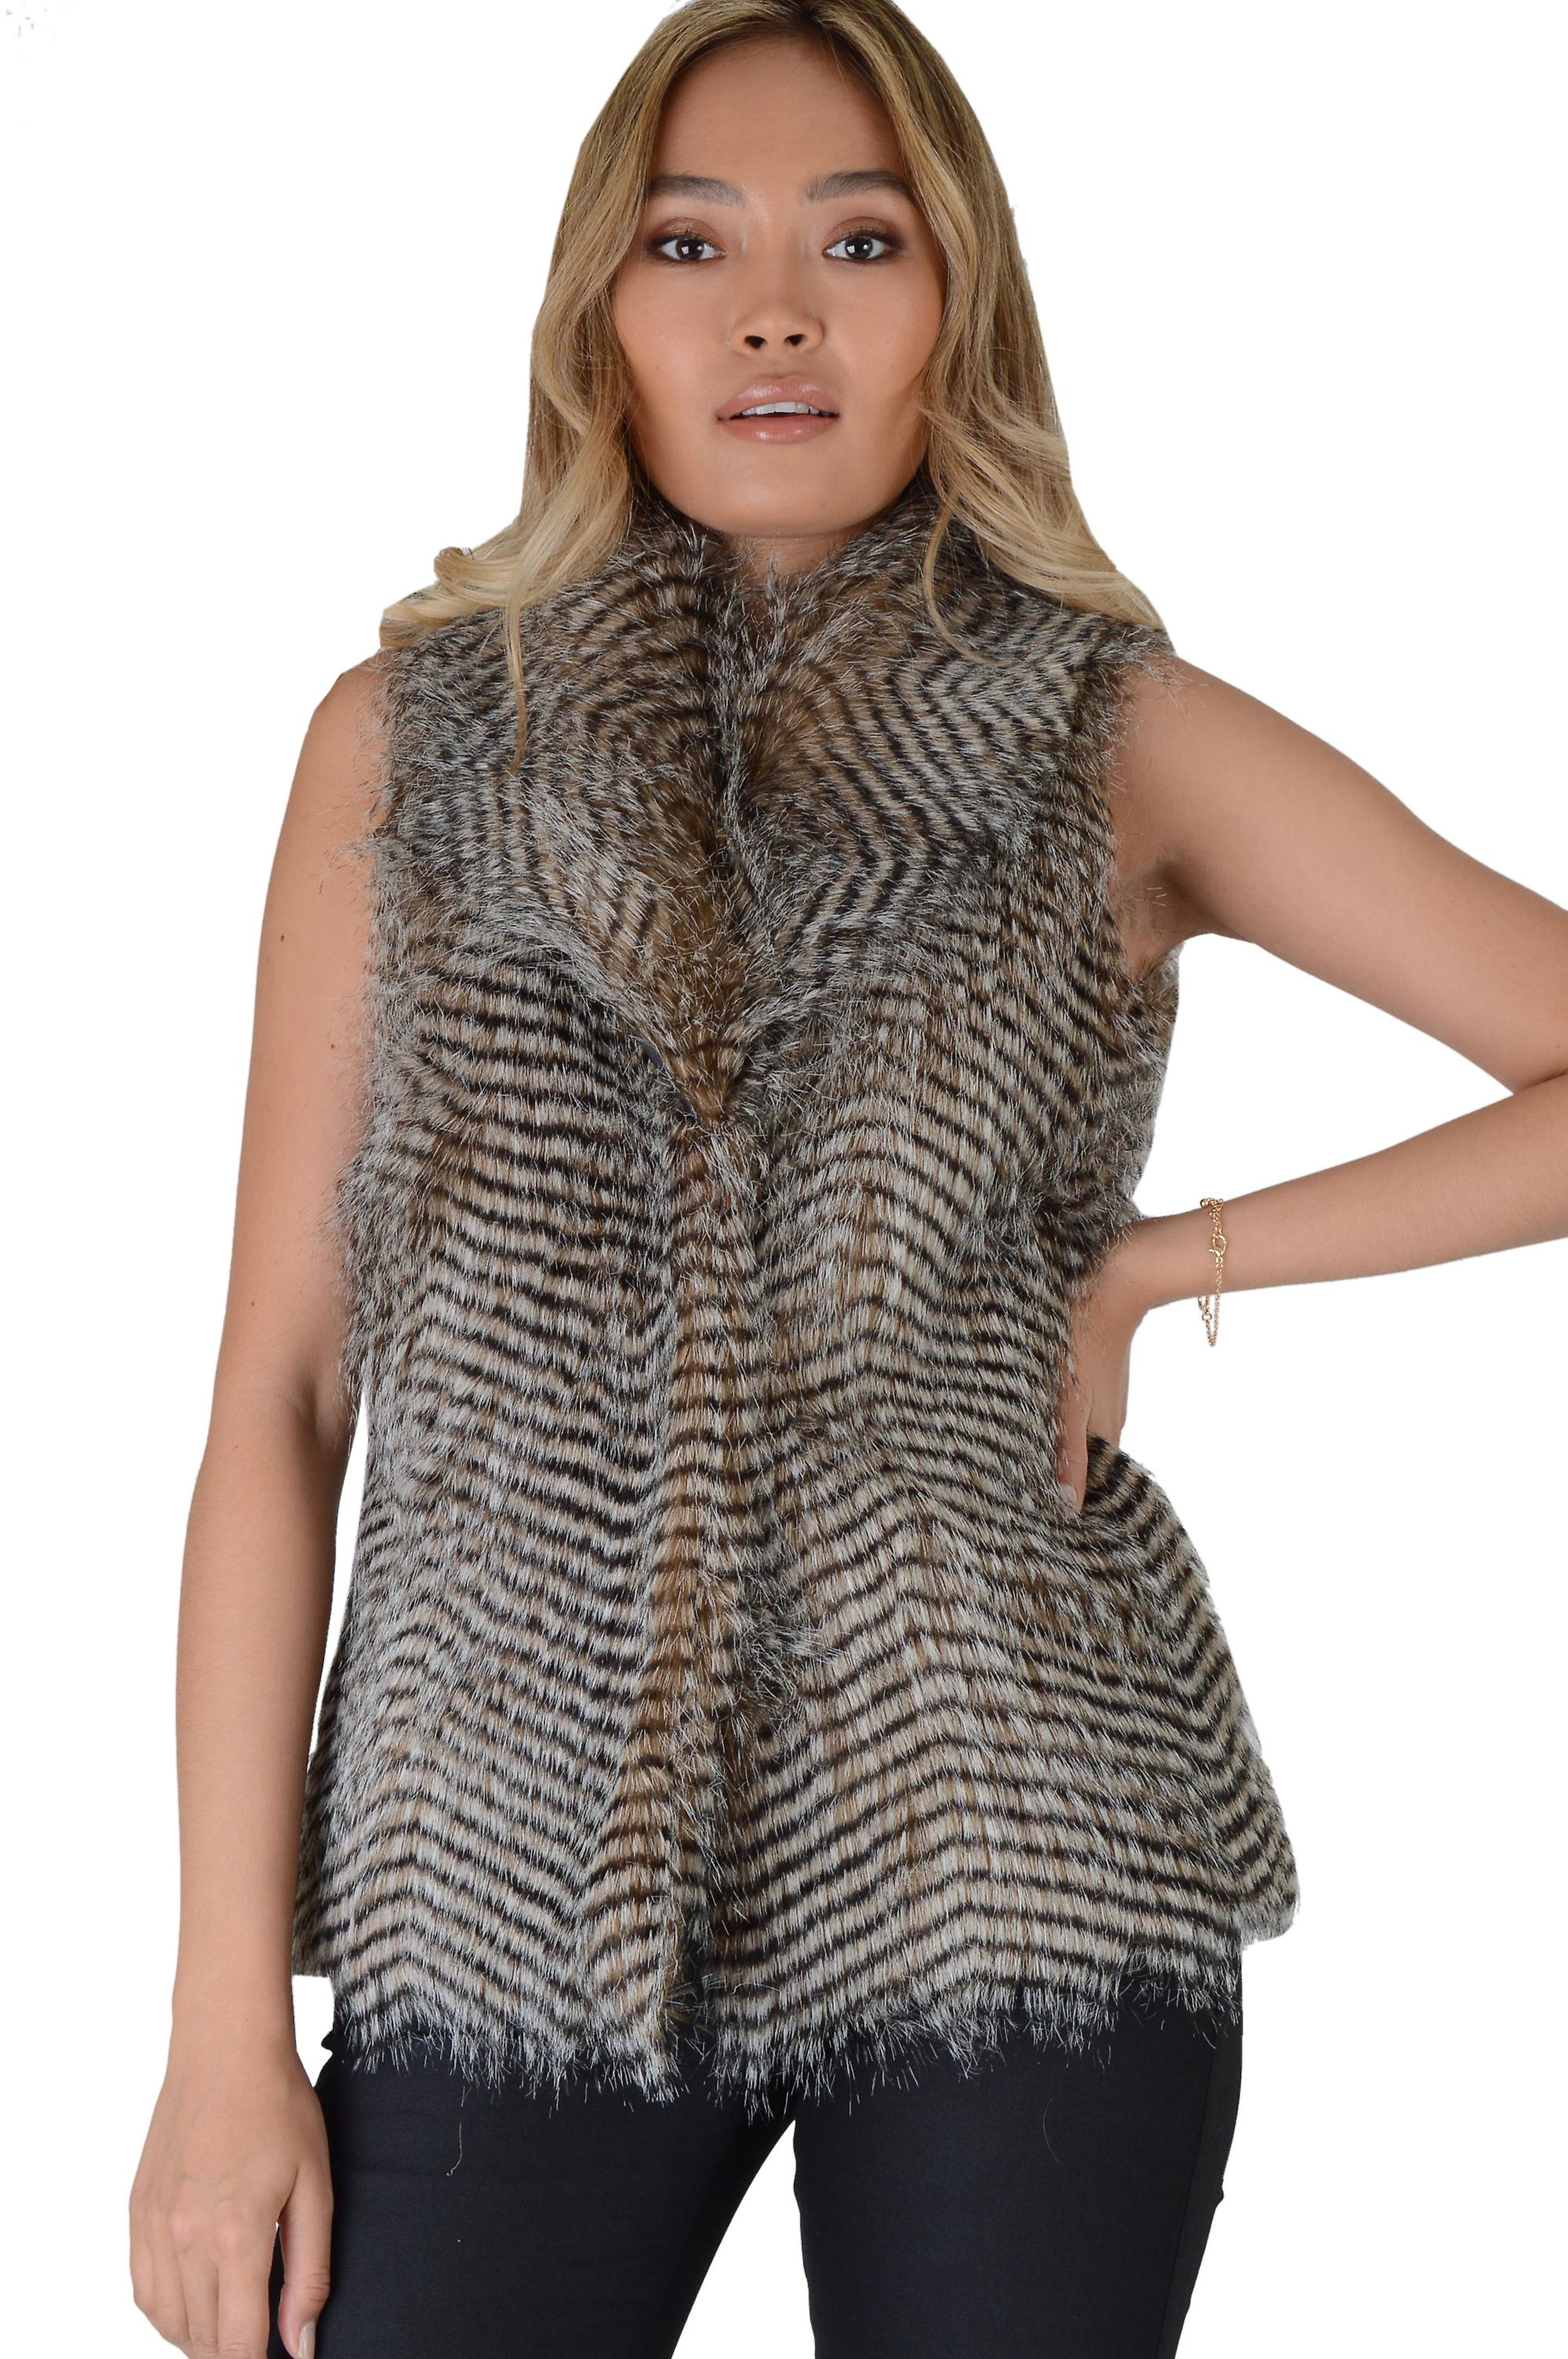 Lovemystyle Faux Fur Gilet With Two Tone Stripe